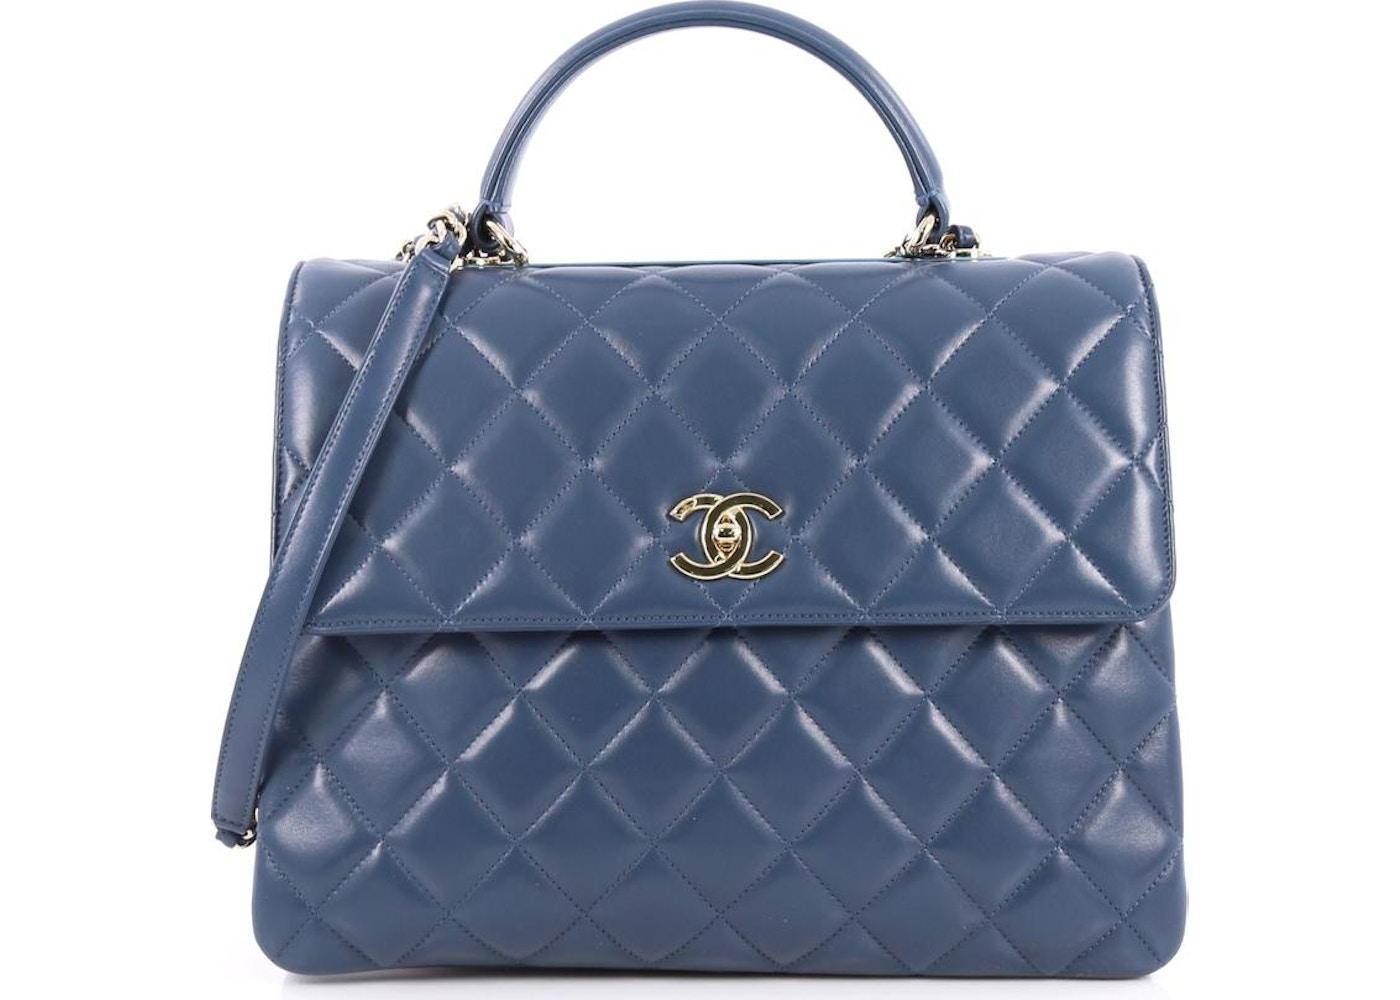 20a90787d3b75 Chanel Trendy CC Top Handle Diamond Quilted Large Blue. Diamond Quilted  Large Blue